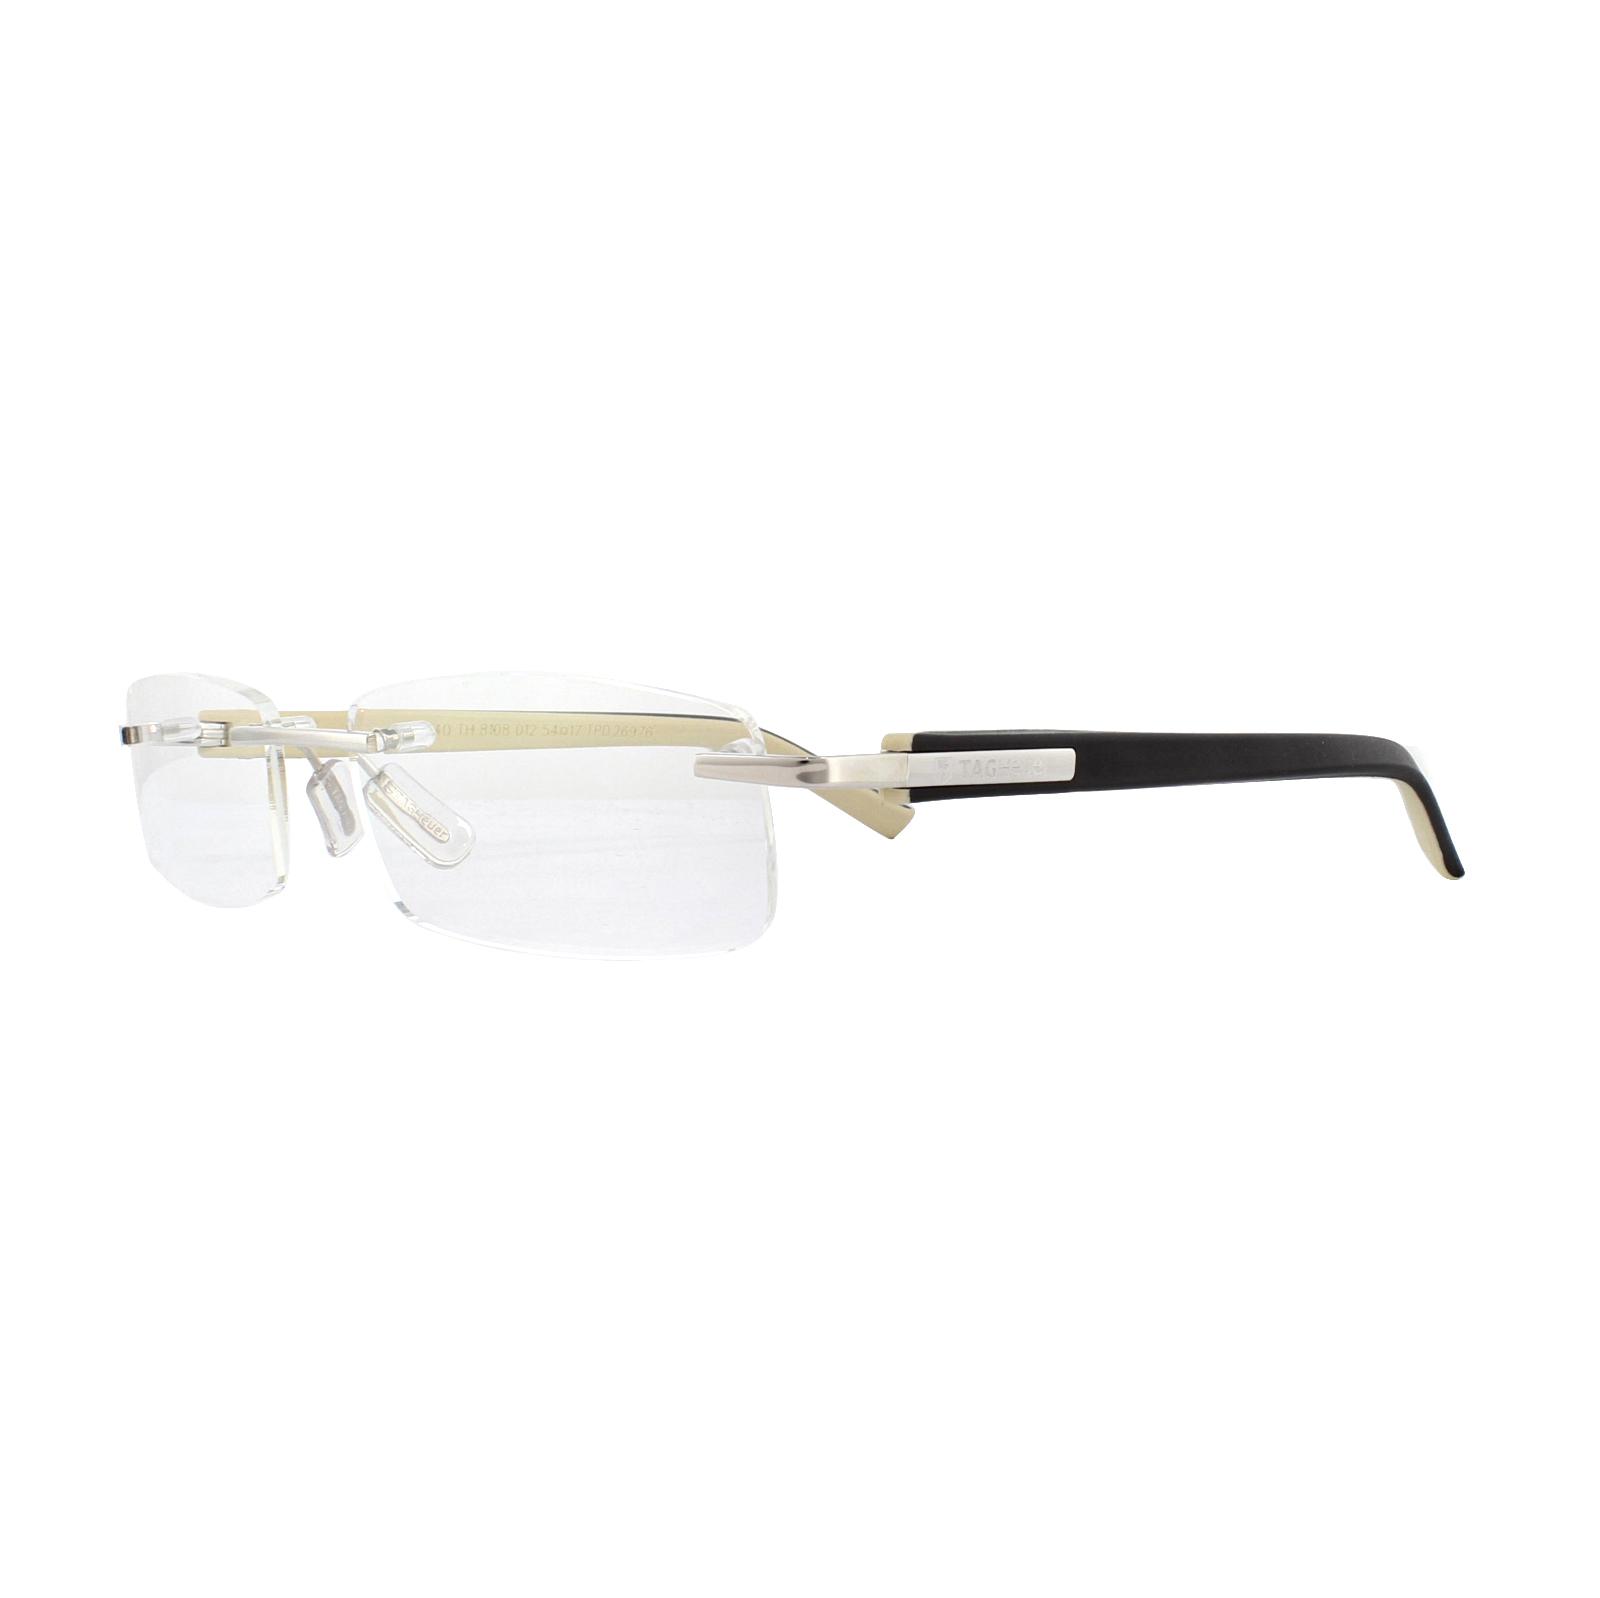 89ec0b02ed0d Sentinel tag heuer glasses frames trends palladium black ivory jpg  1600x1598 Eyeglass security tags